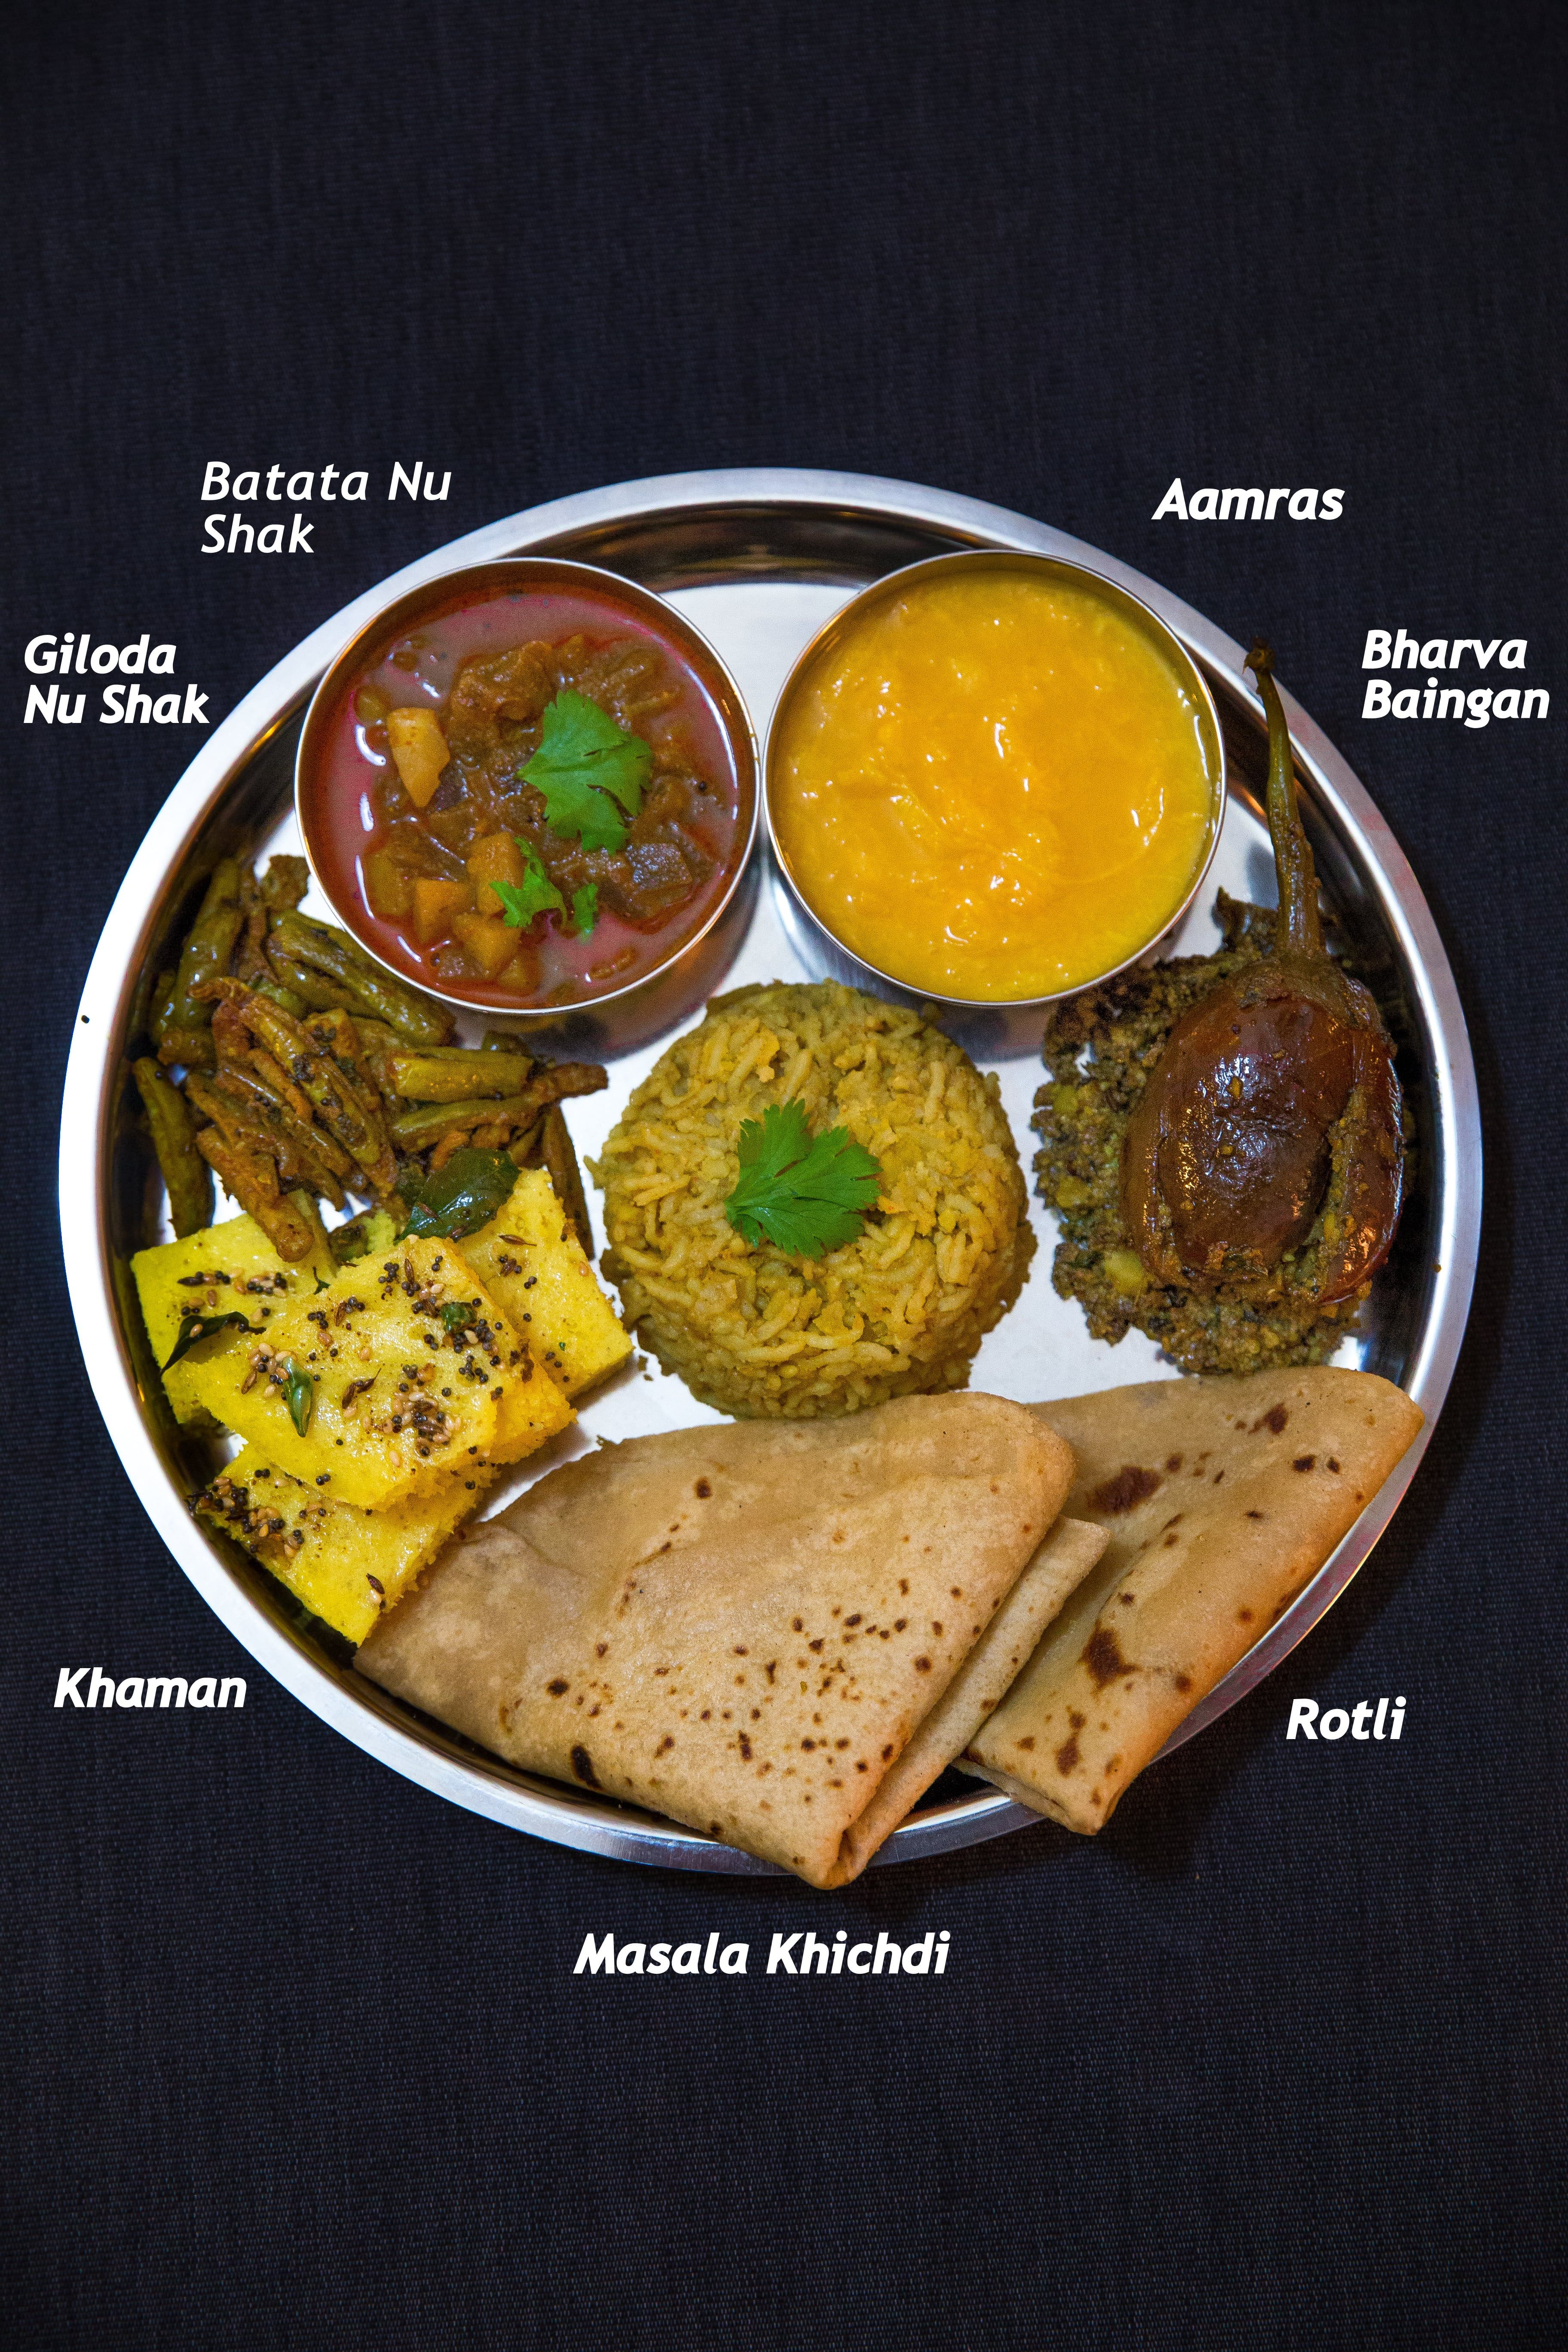 Gujarati Thali Recipes Gujarati cuisine, Indian food